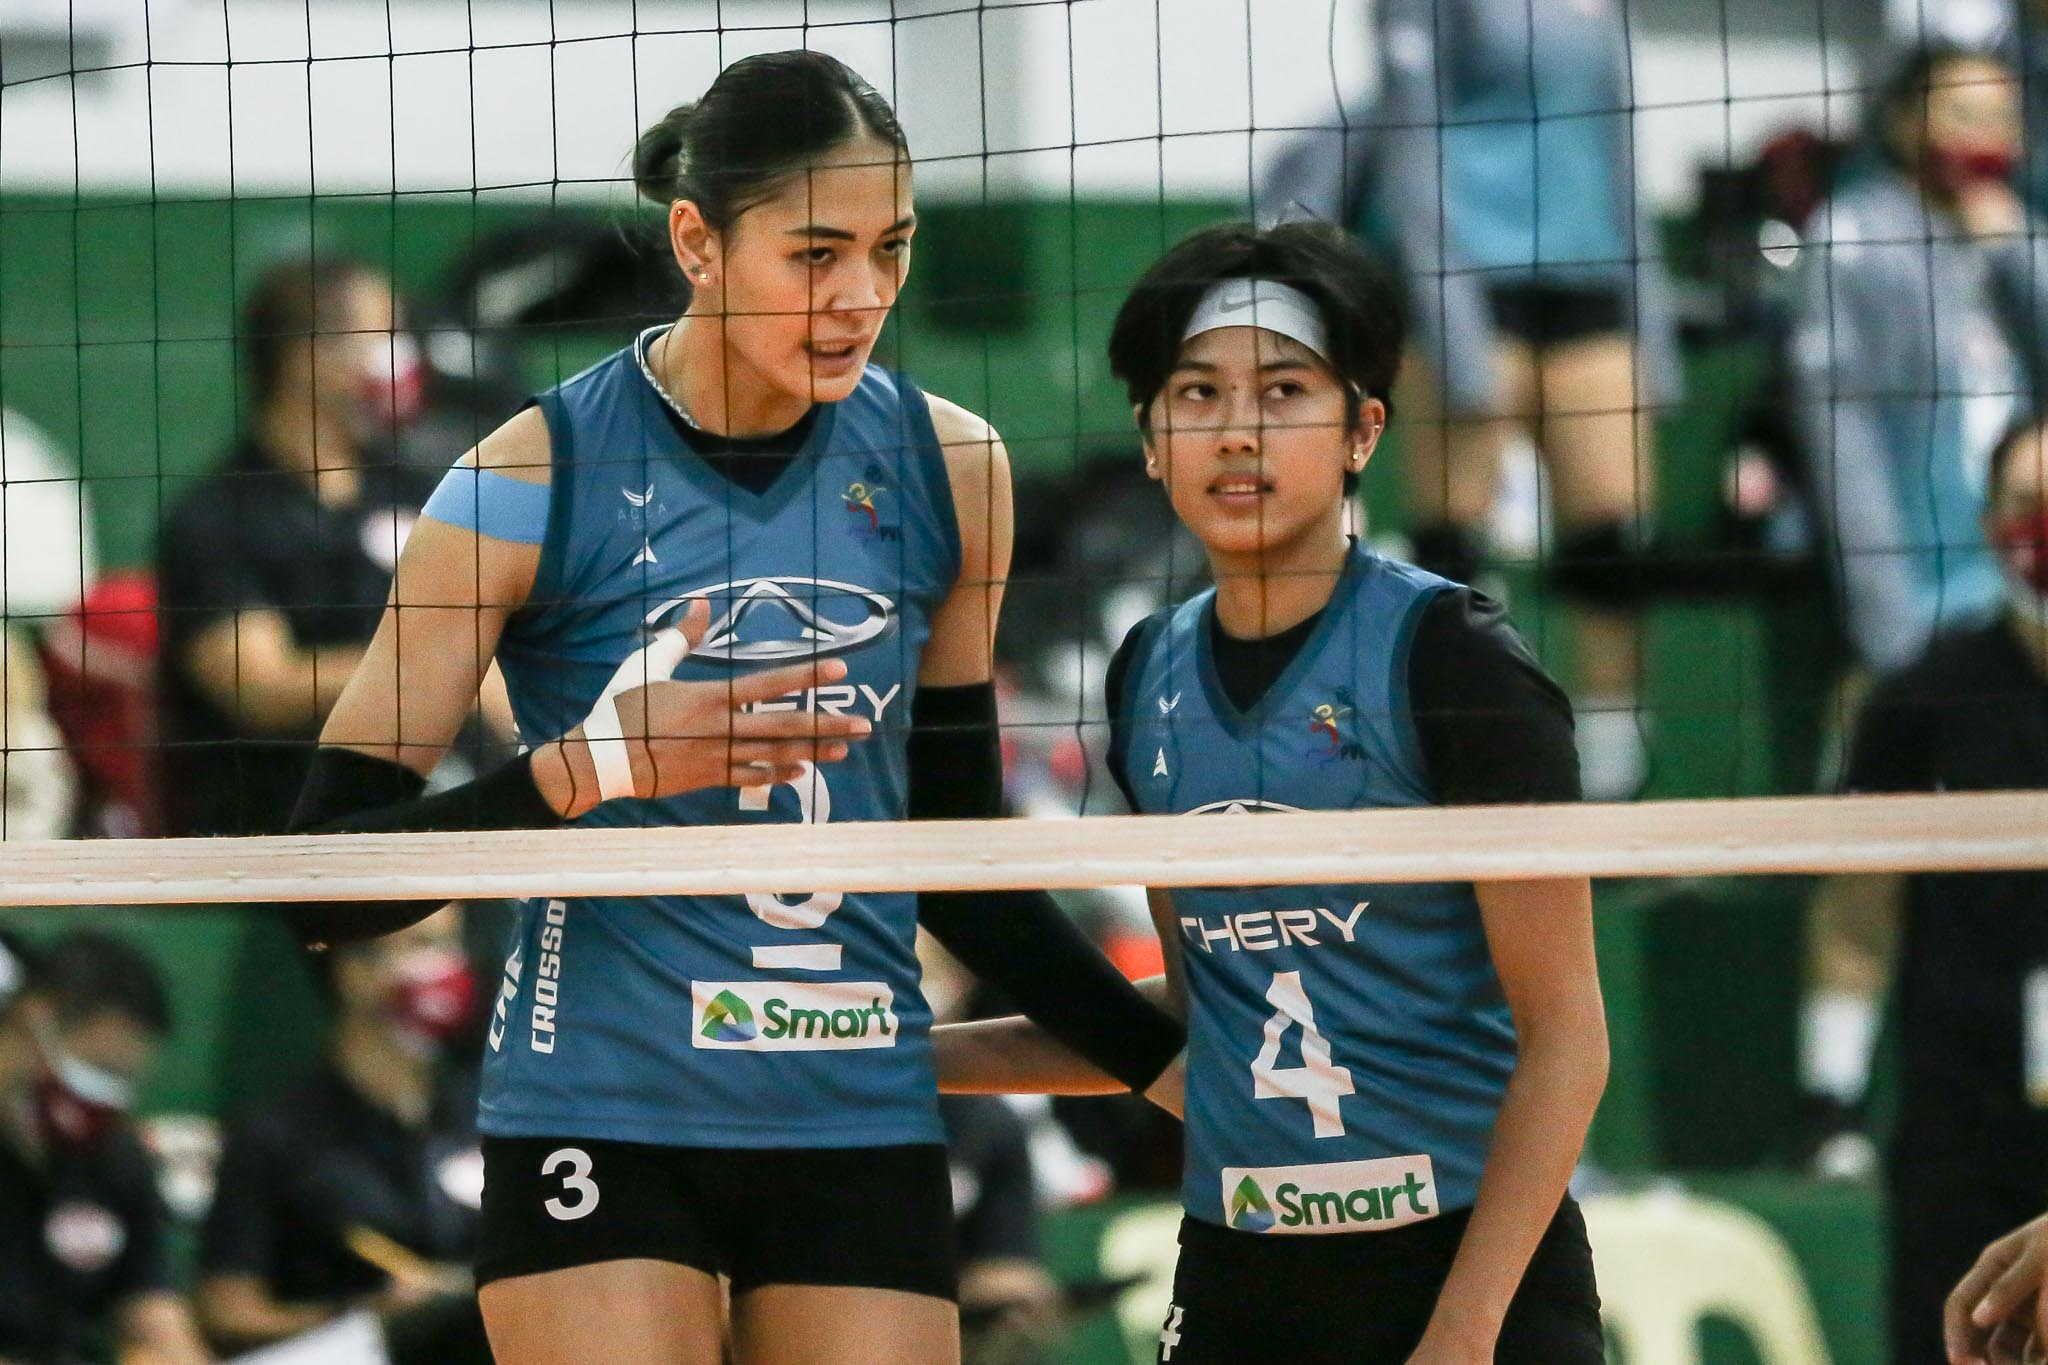 PVL-2021-Chery-Tiggo-vs-PLDT-Jaja-Santiago-Jasmine-Nabor-Chery Jaja, Dindin relish on-court reunion, looks forward for more News PVL Volleyball  - philippine sports news